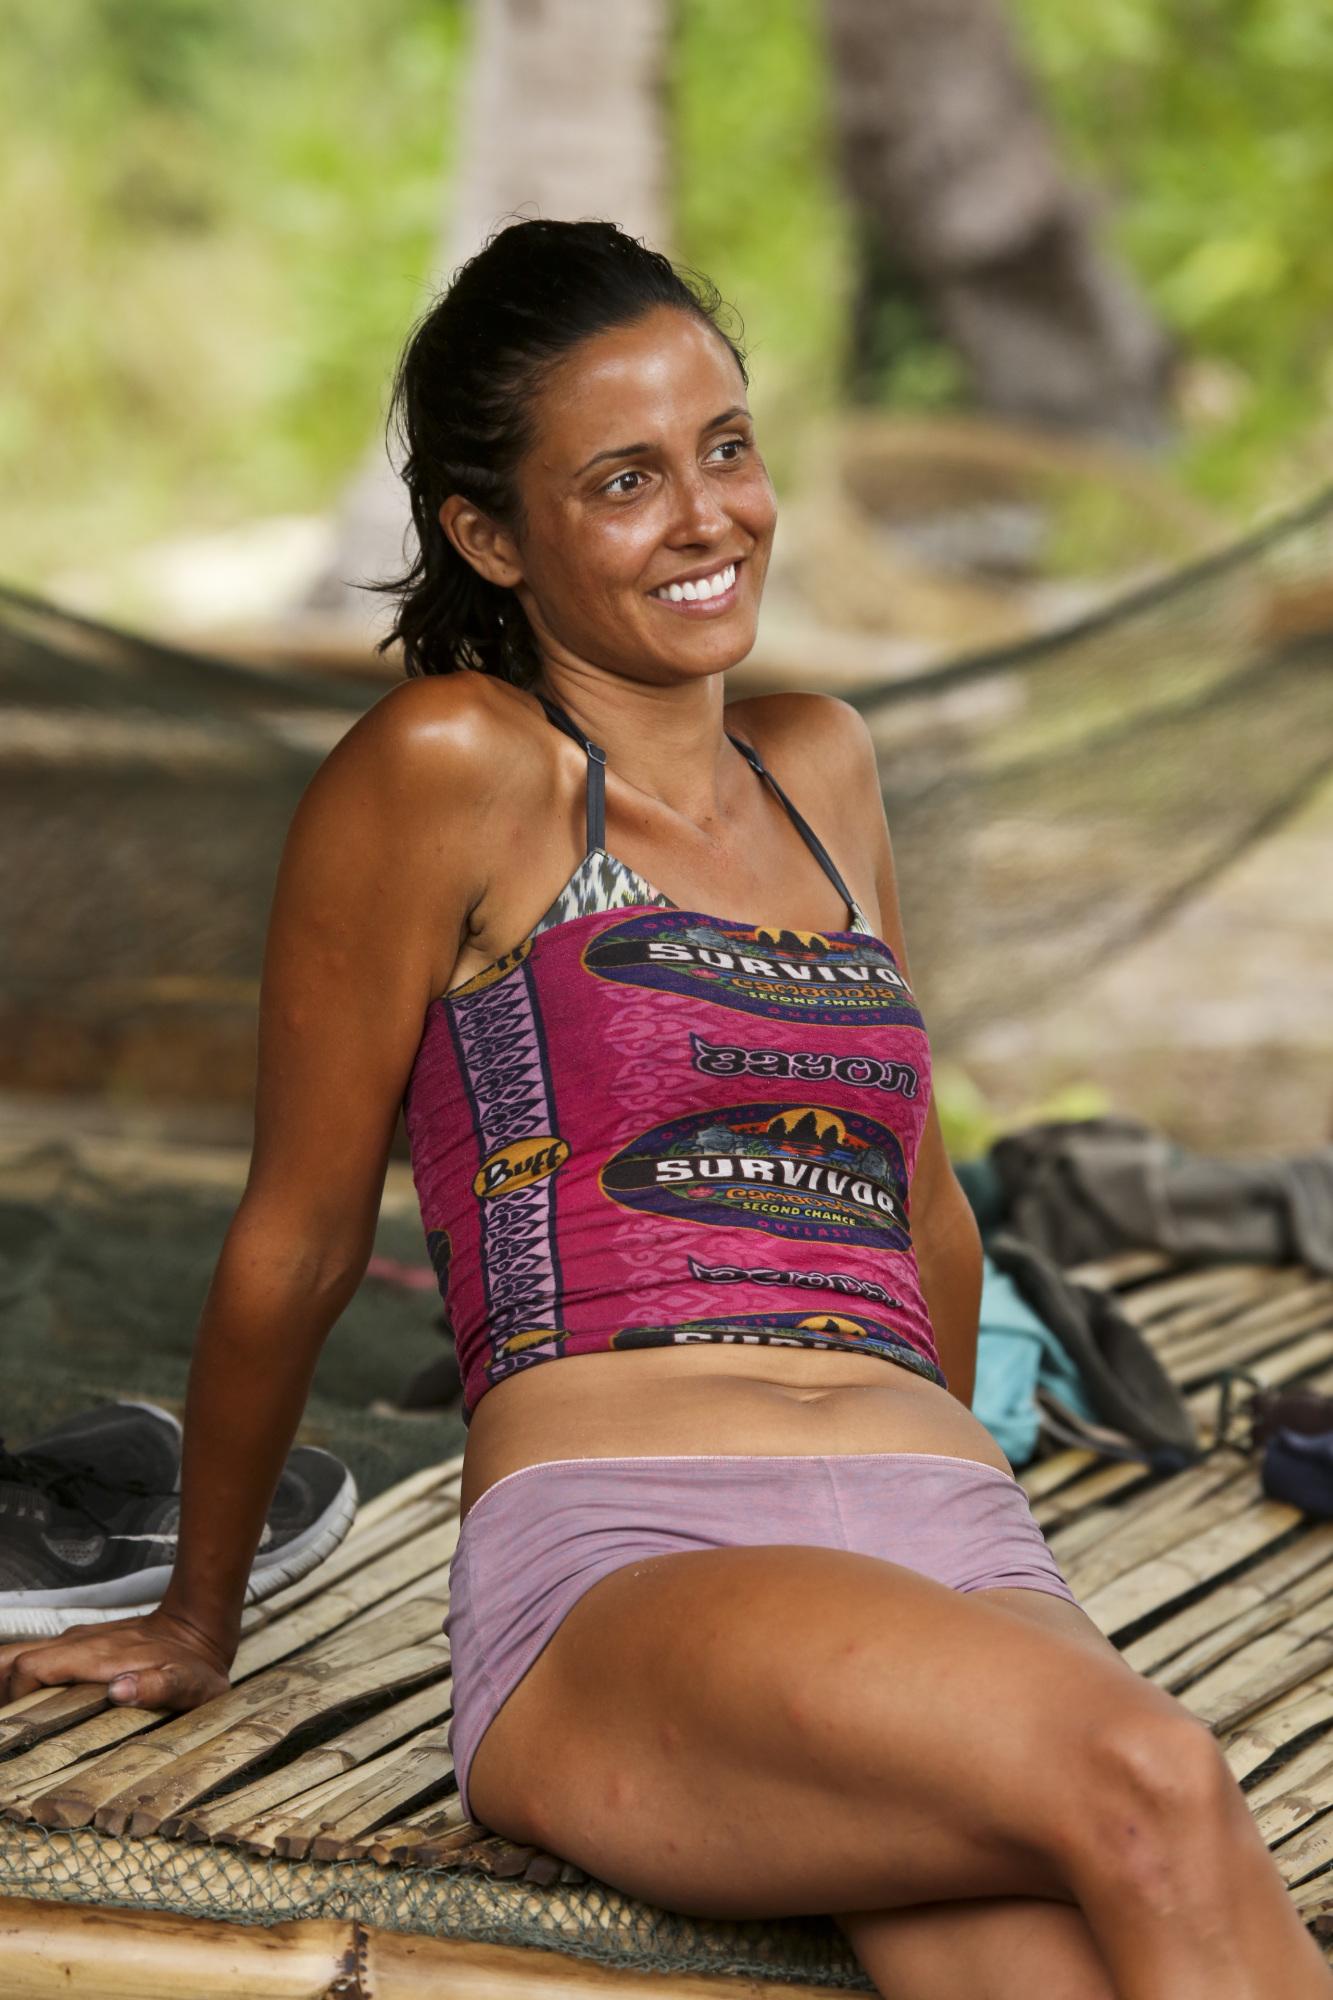 Monica Padilla at Bayon camp on Survivor: Second Chance